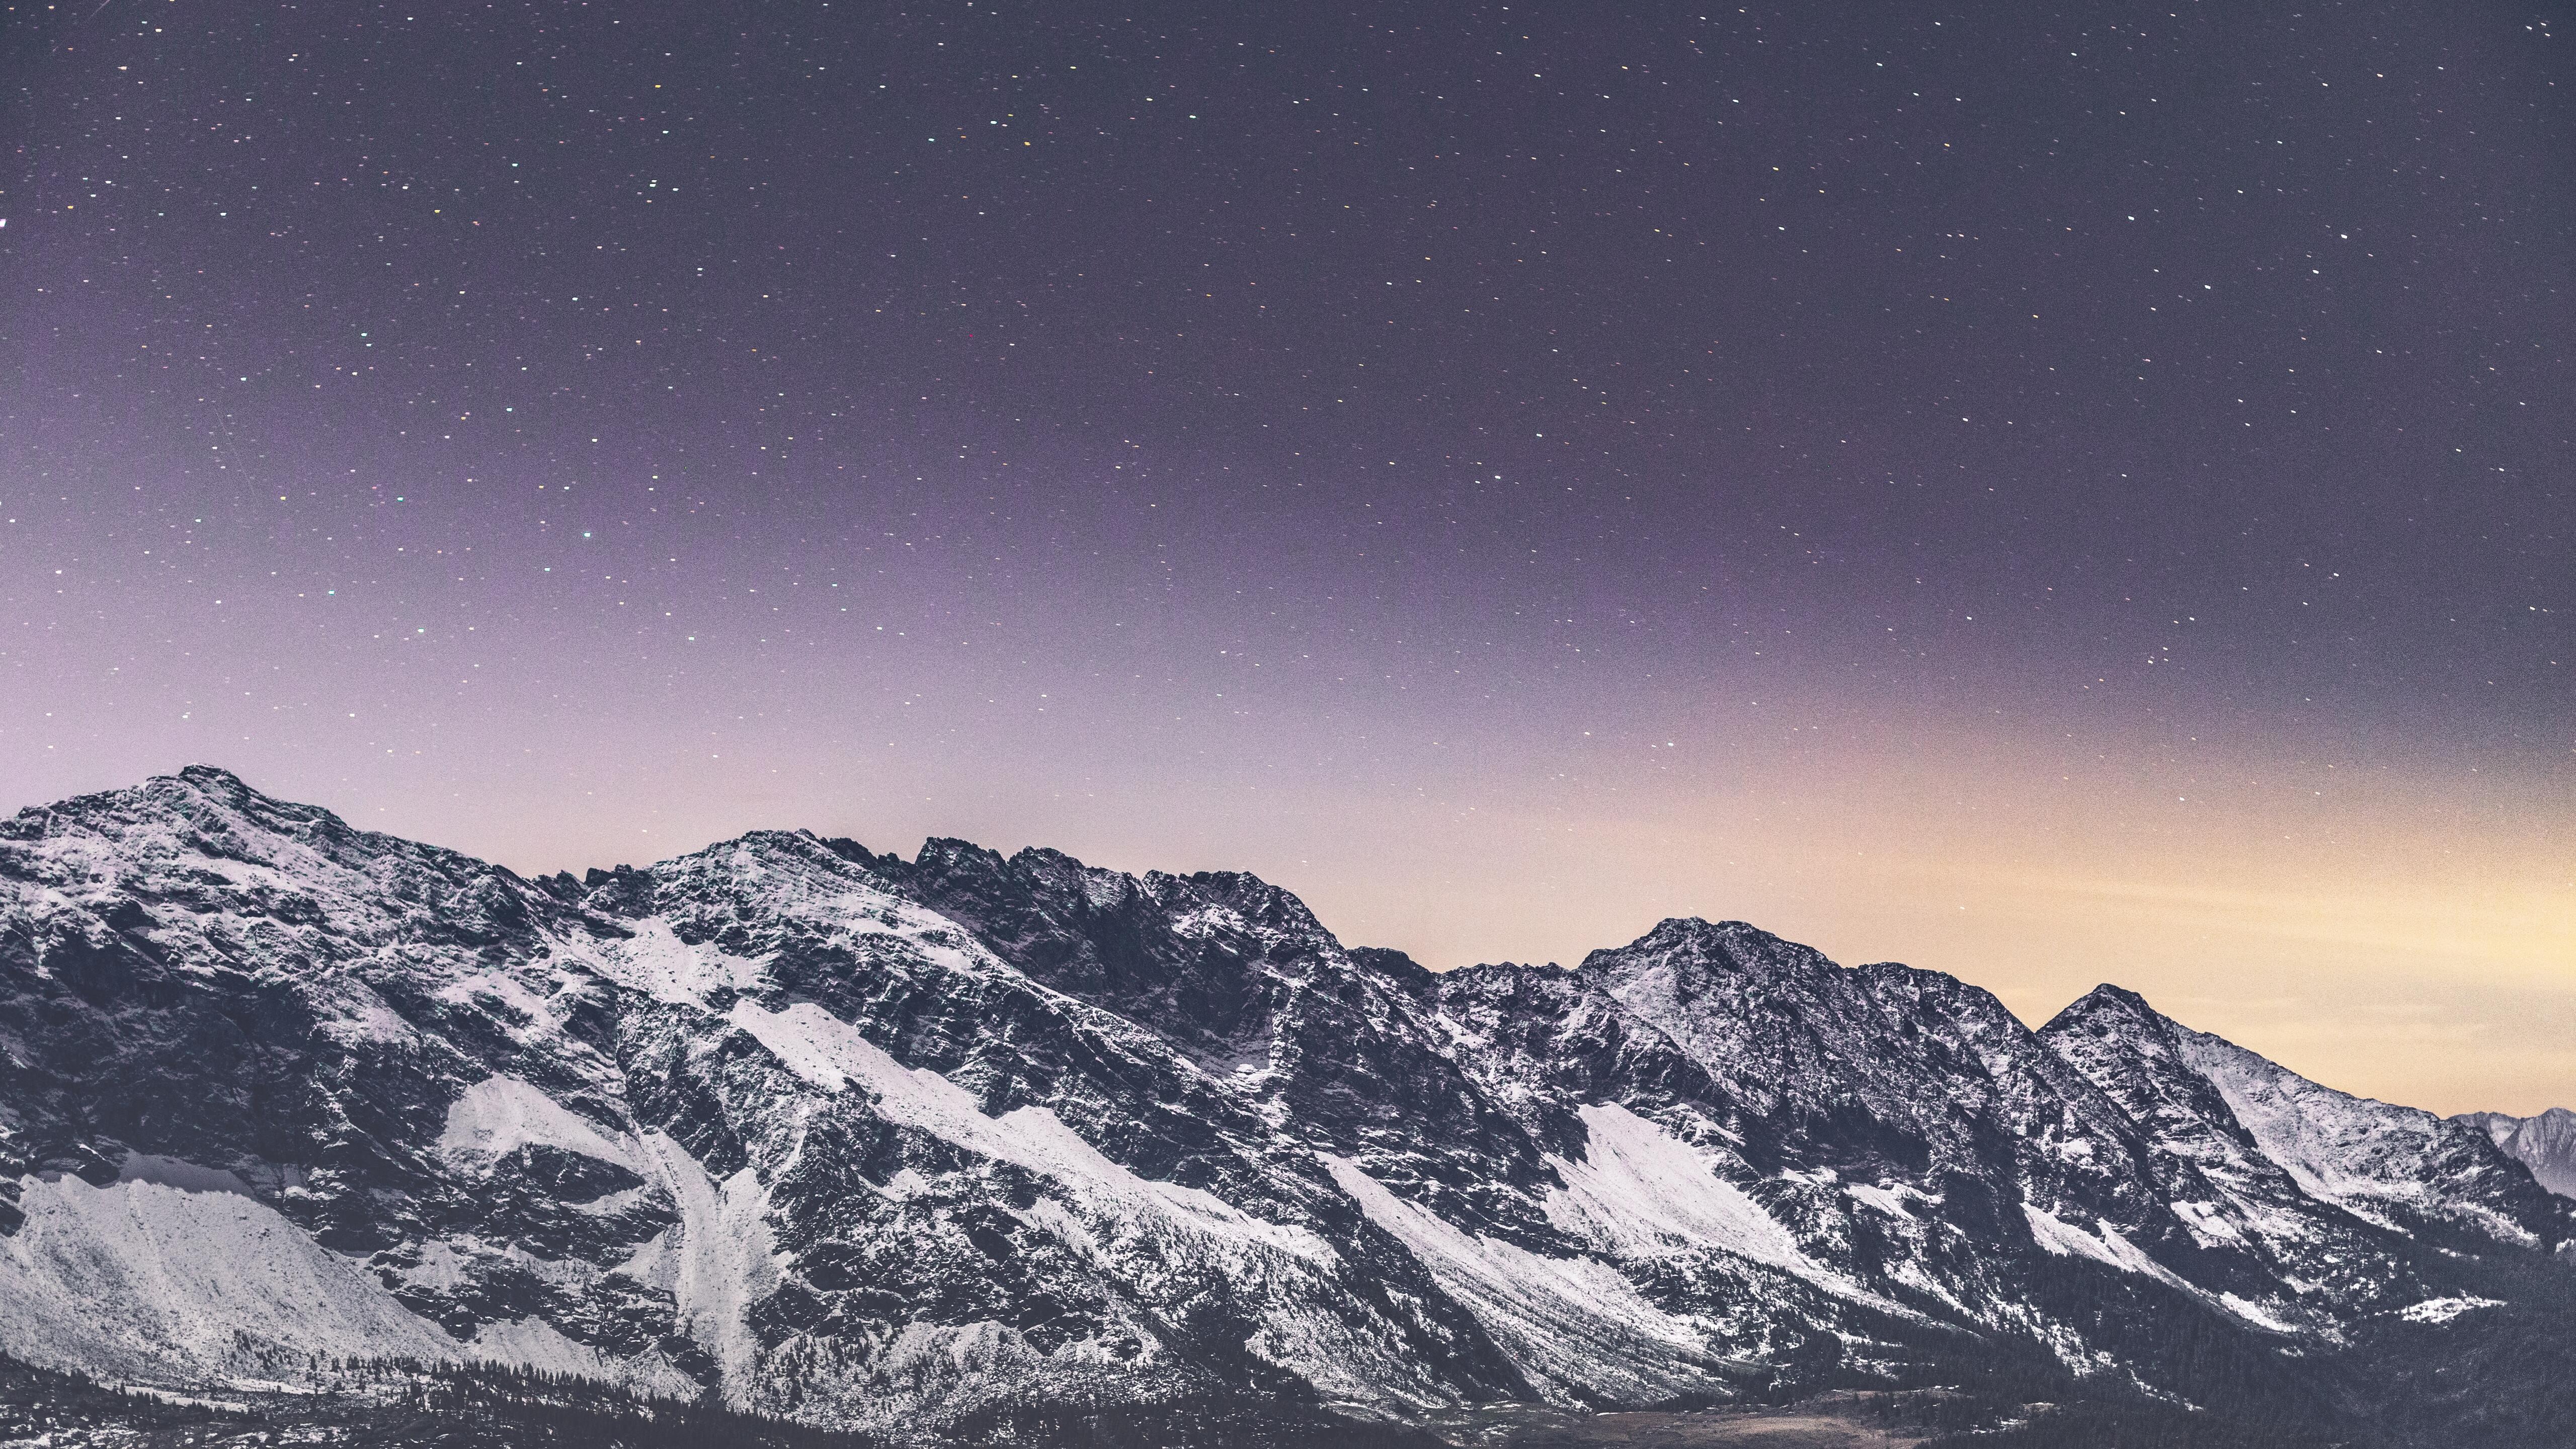 snow-covered-mountains-stars-5k-8m.jpg